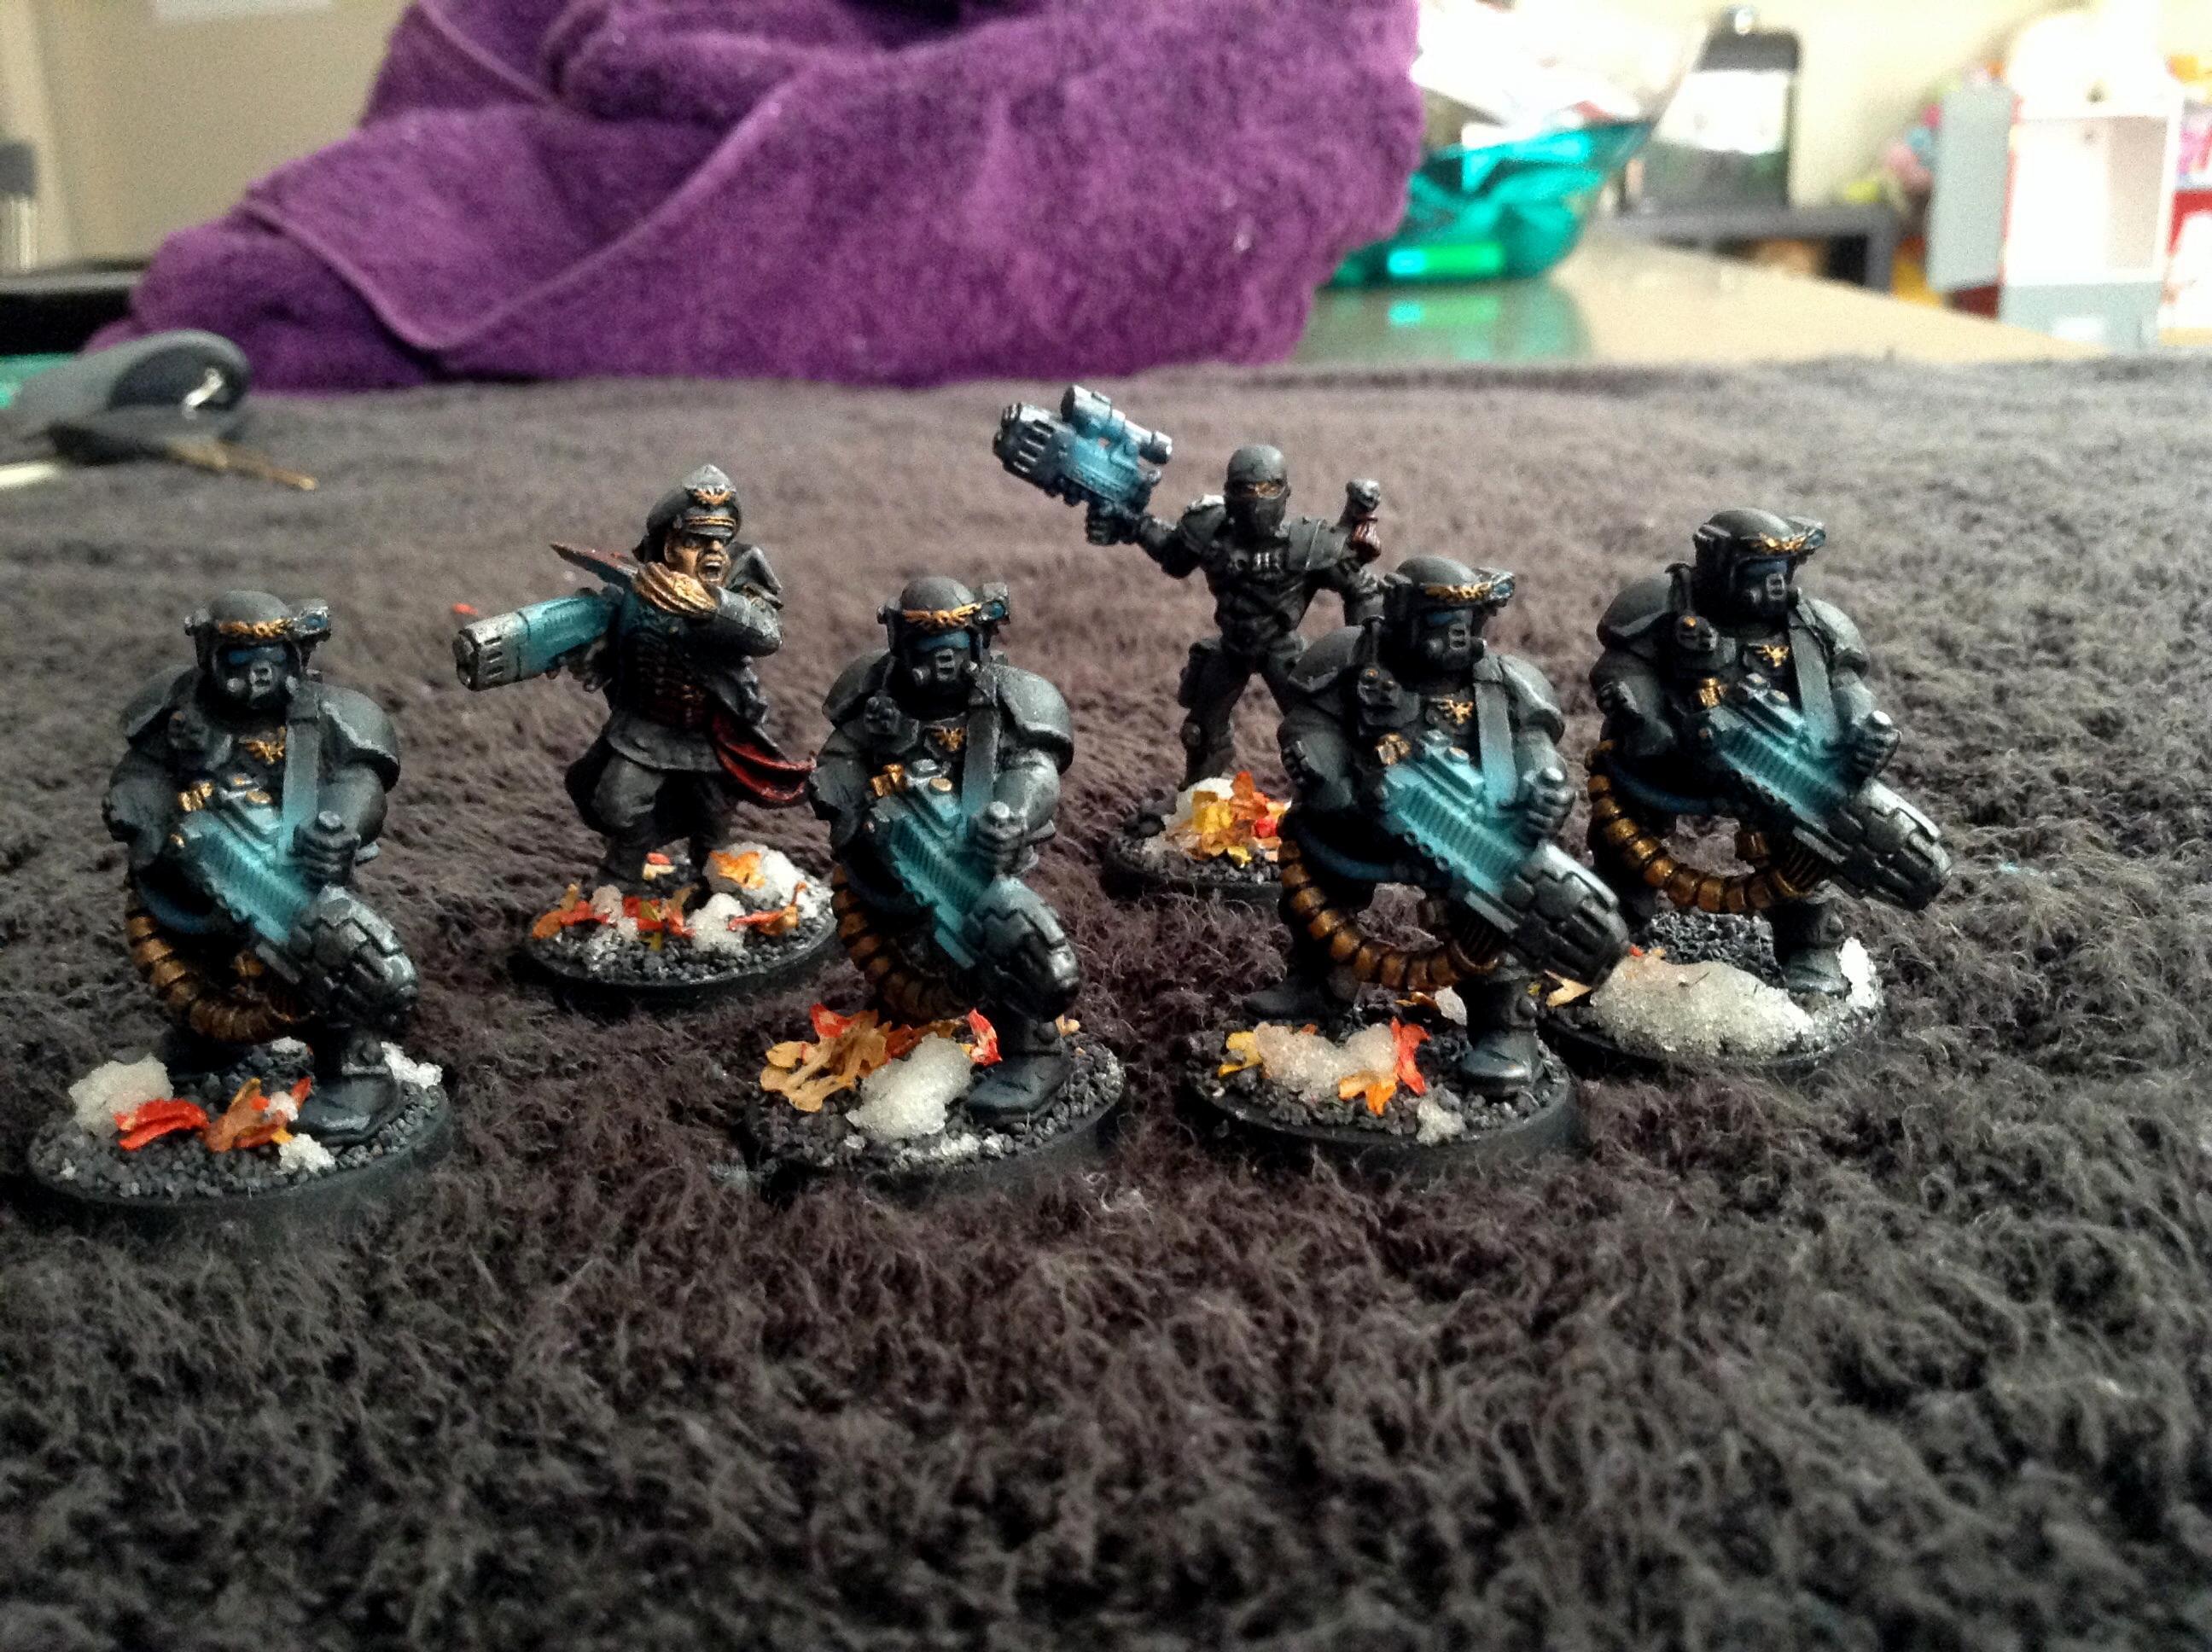 Astra Militarum, Comissar, Imperial Assassin, Imperial Guard, Kasrkin, Scions